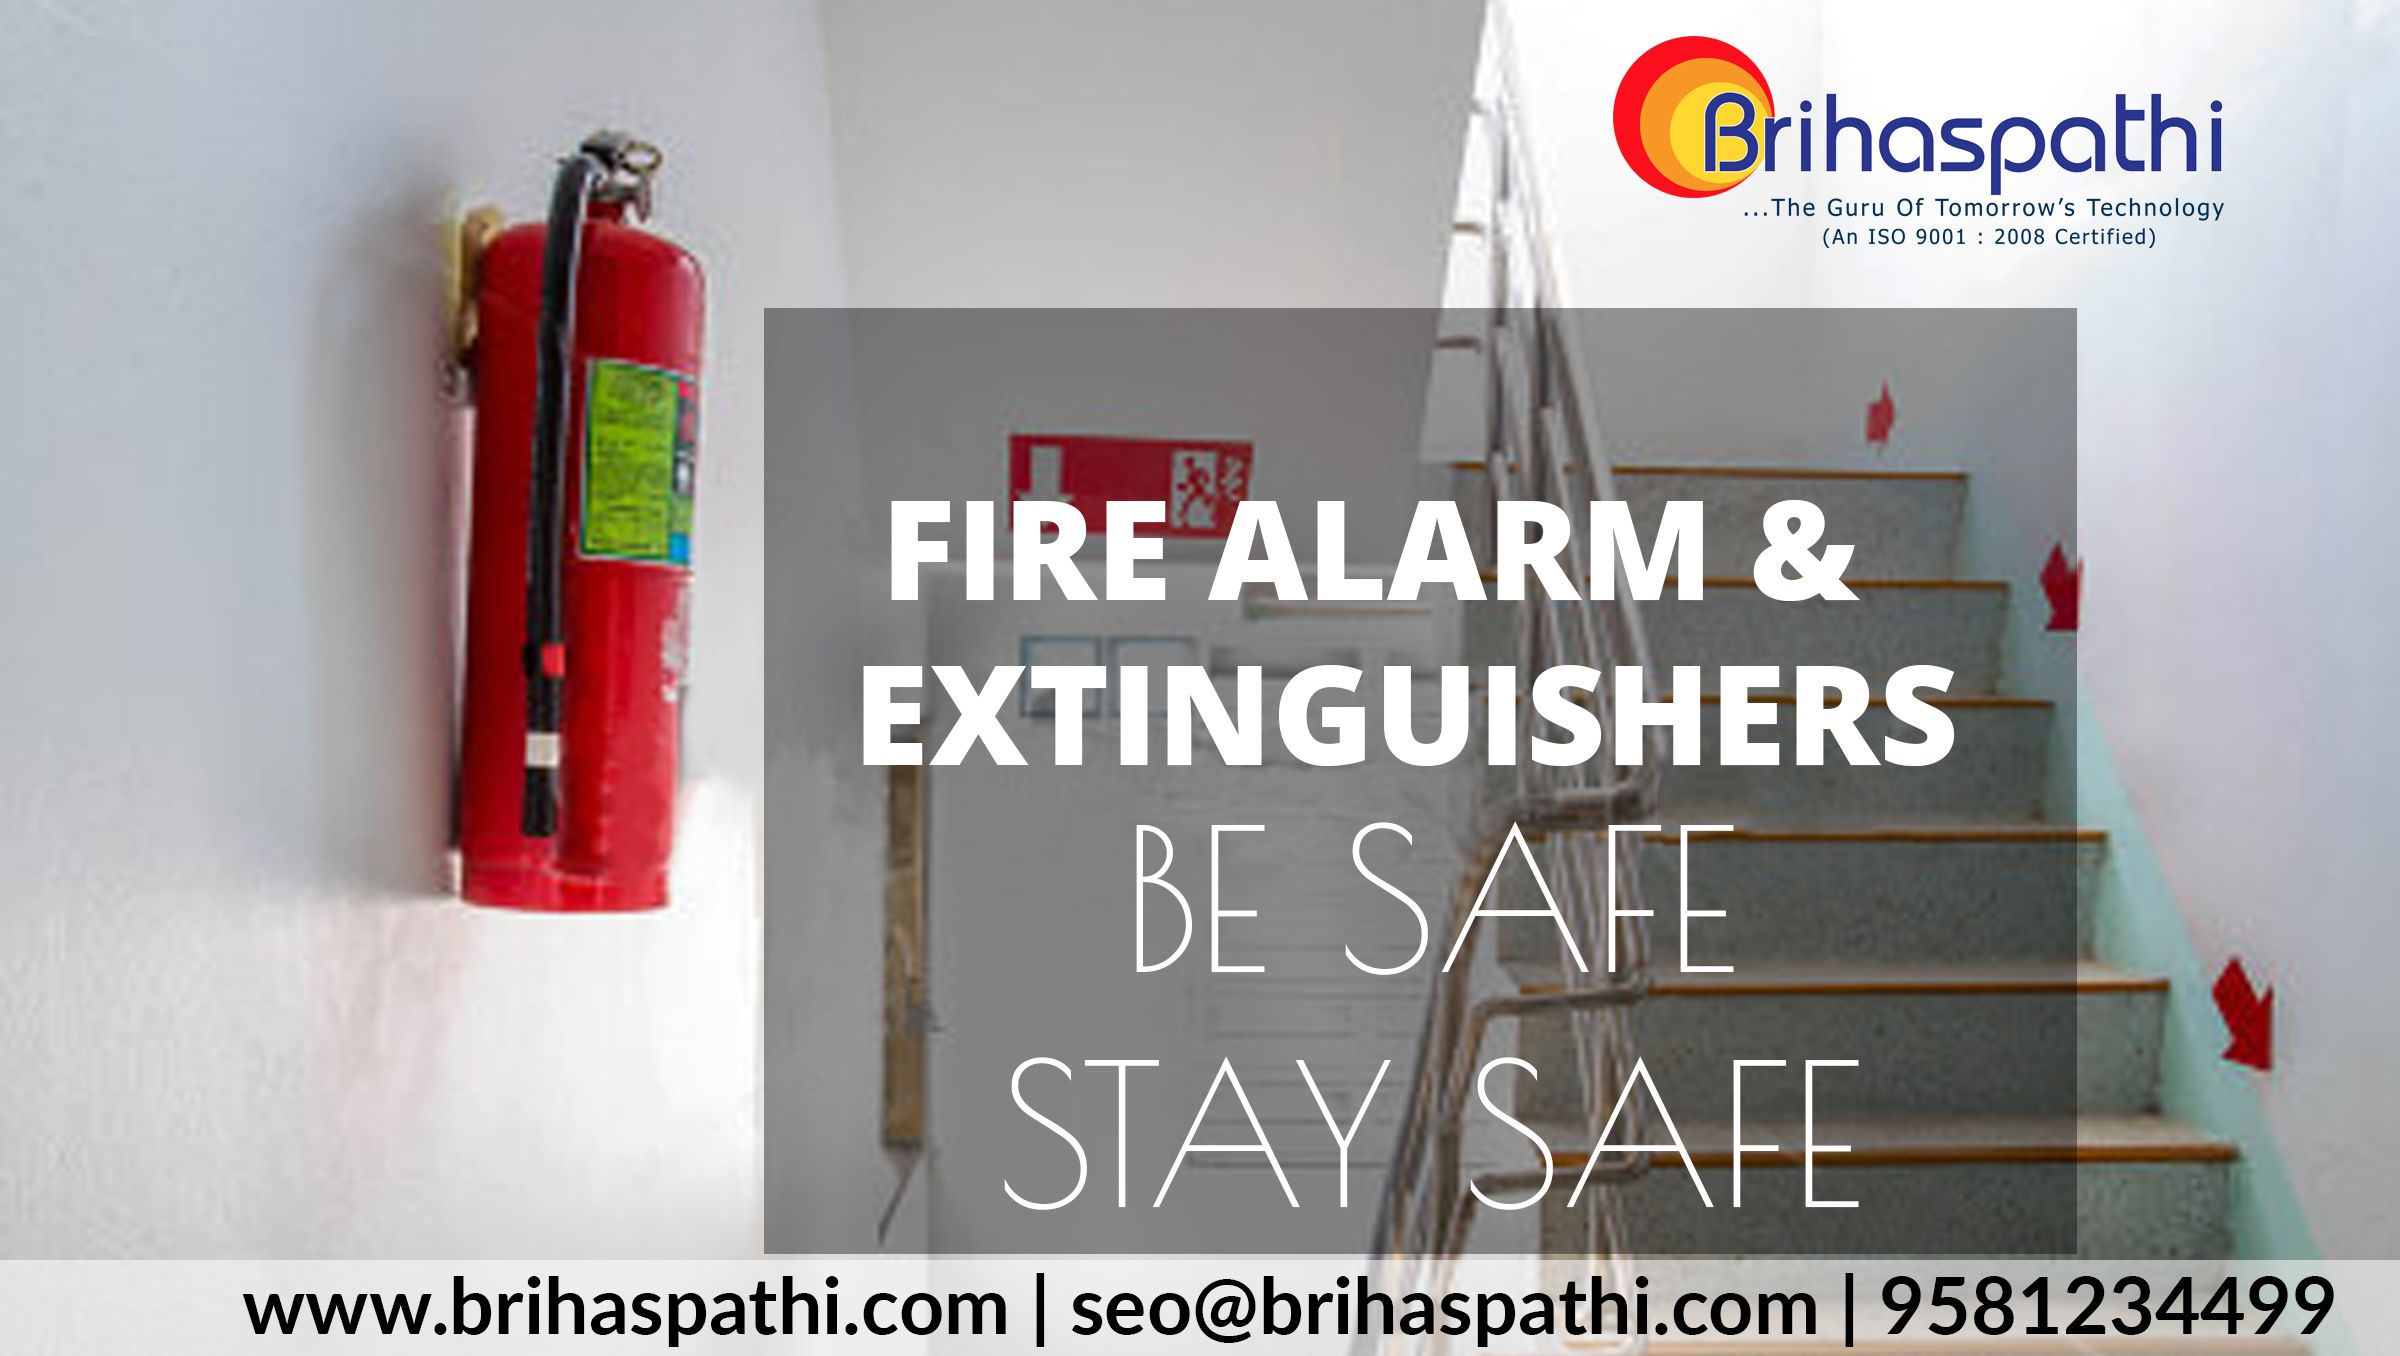 Brihaspathi FireAlarmExtinguishers be safe stay safe